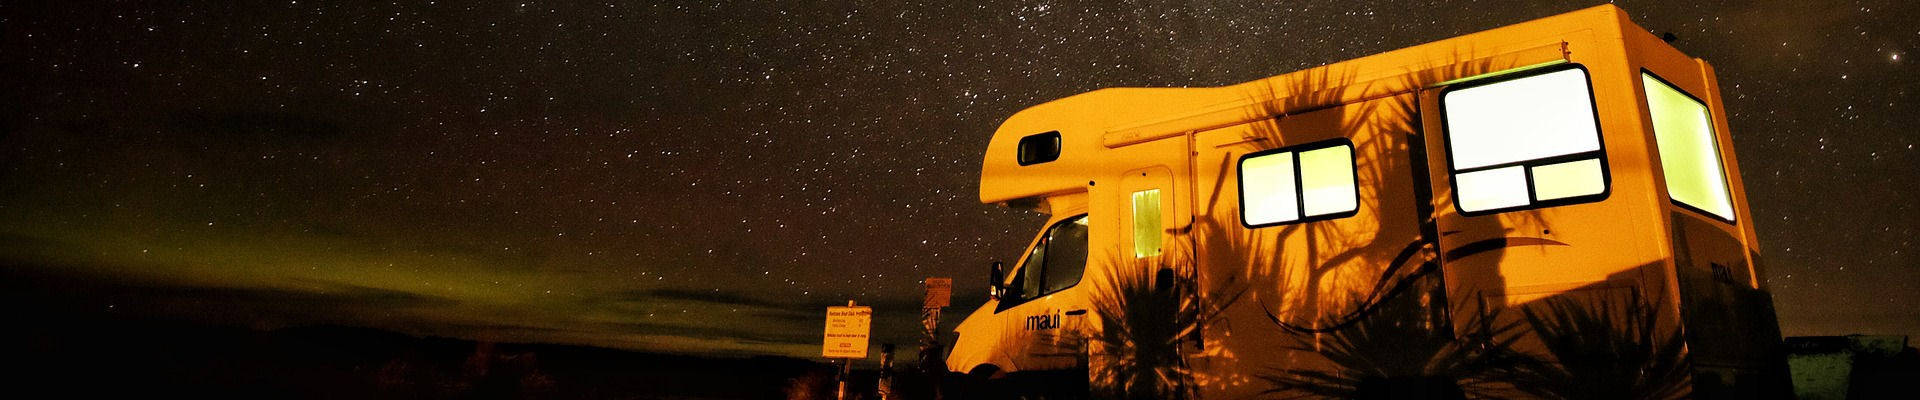 v1-2-camping-car-400px-730